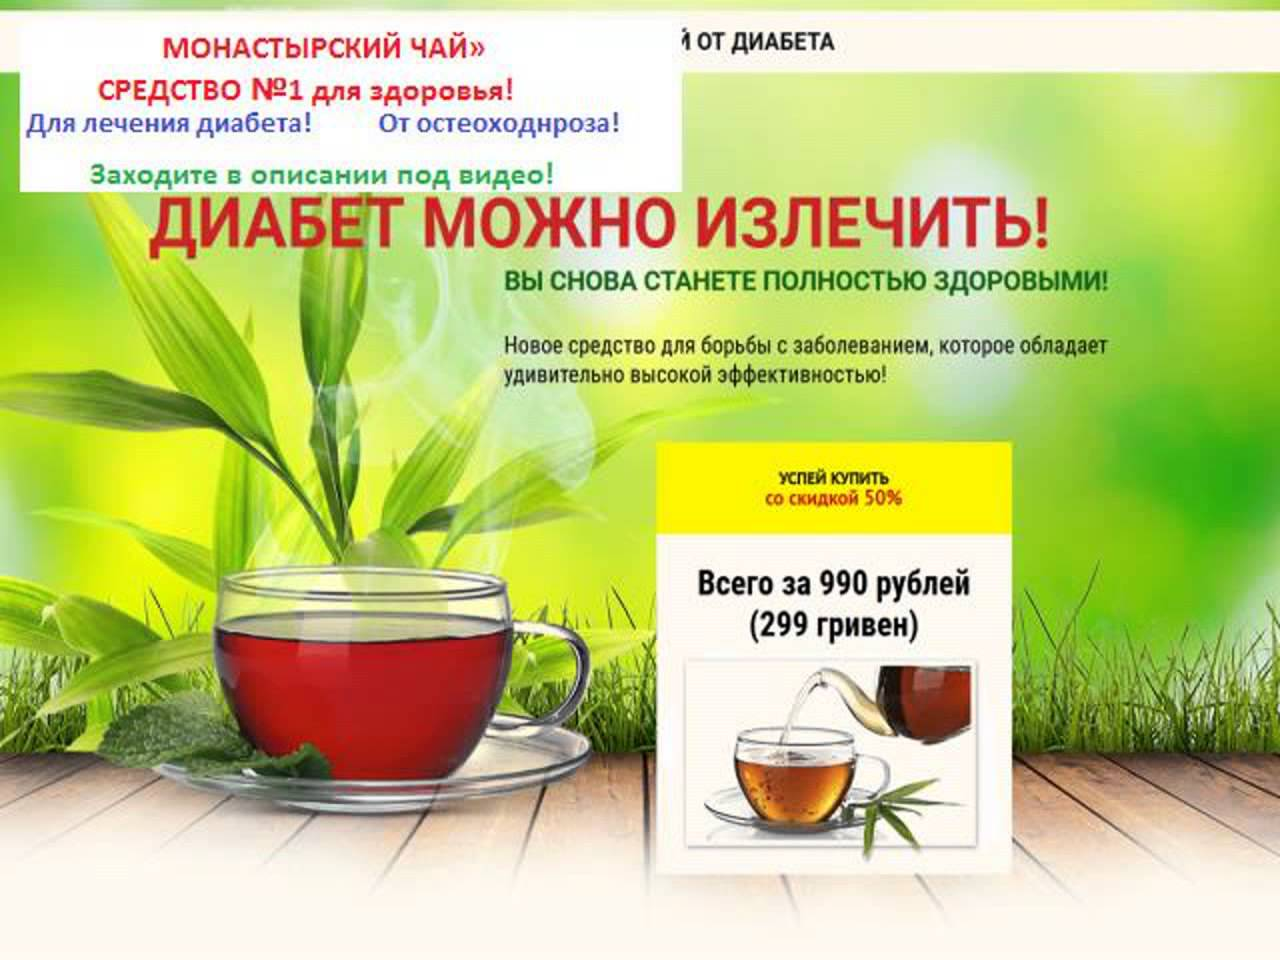 Монастырский чай при диабете